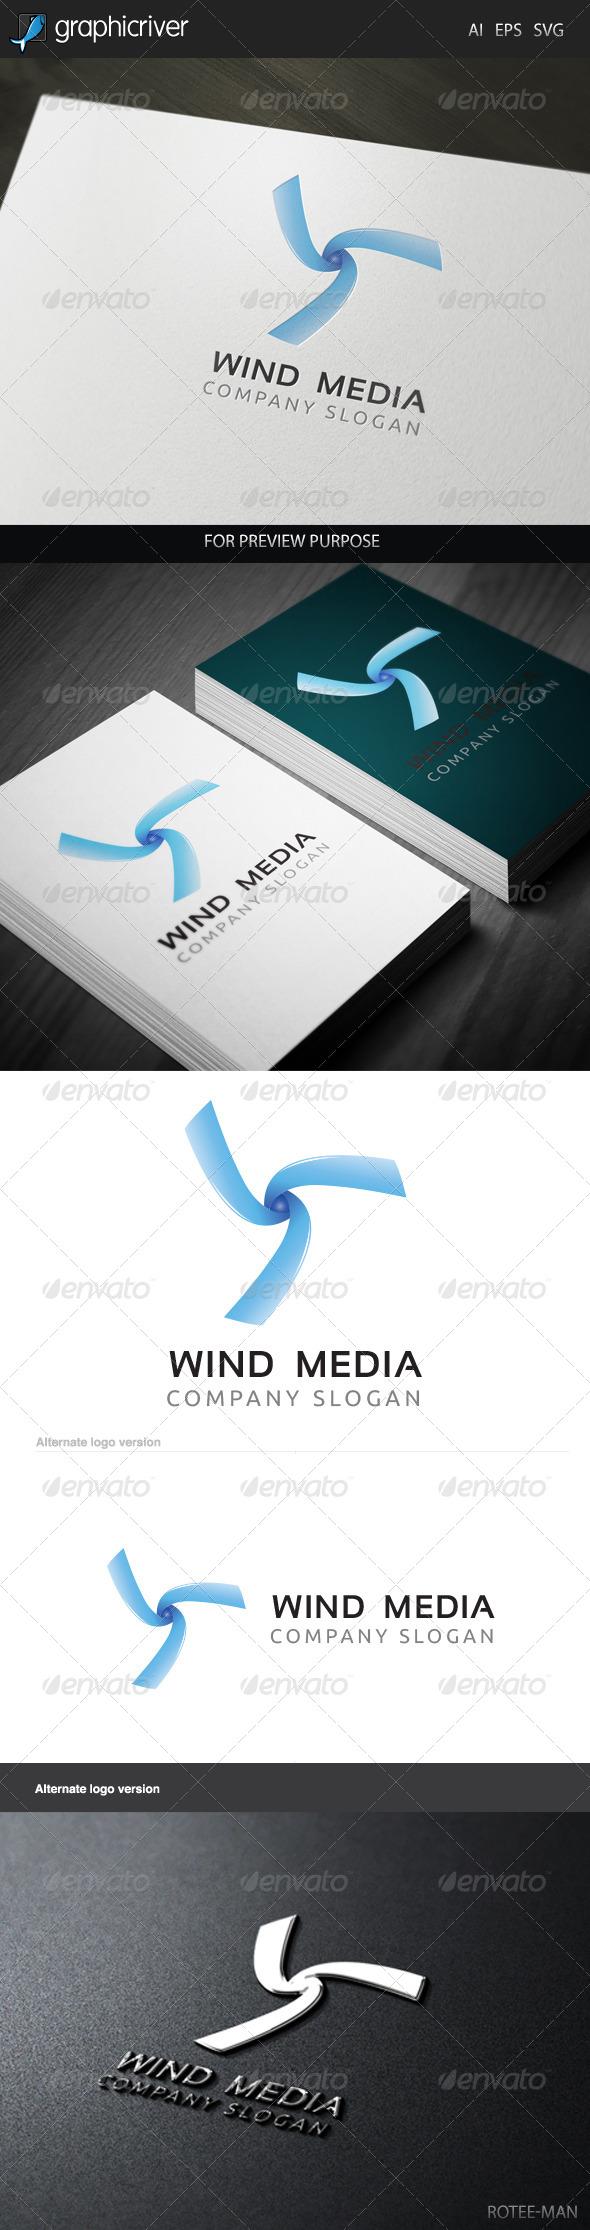 GraphicRiver Wind Media 2 Logo 6021598